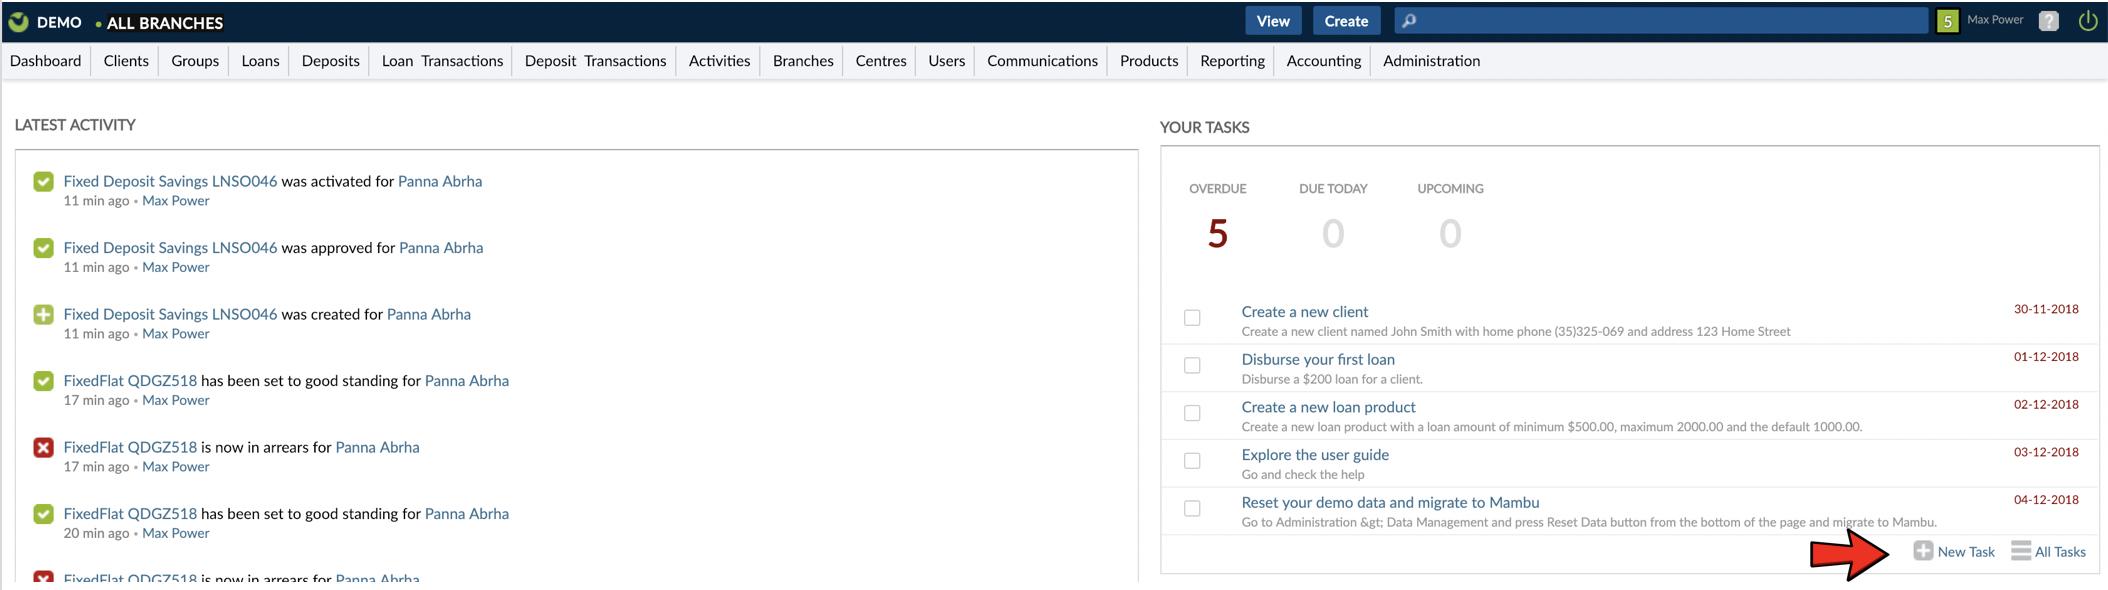 Create Task from Dashboard